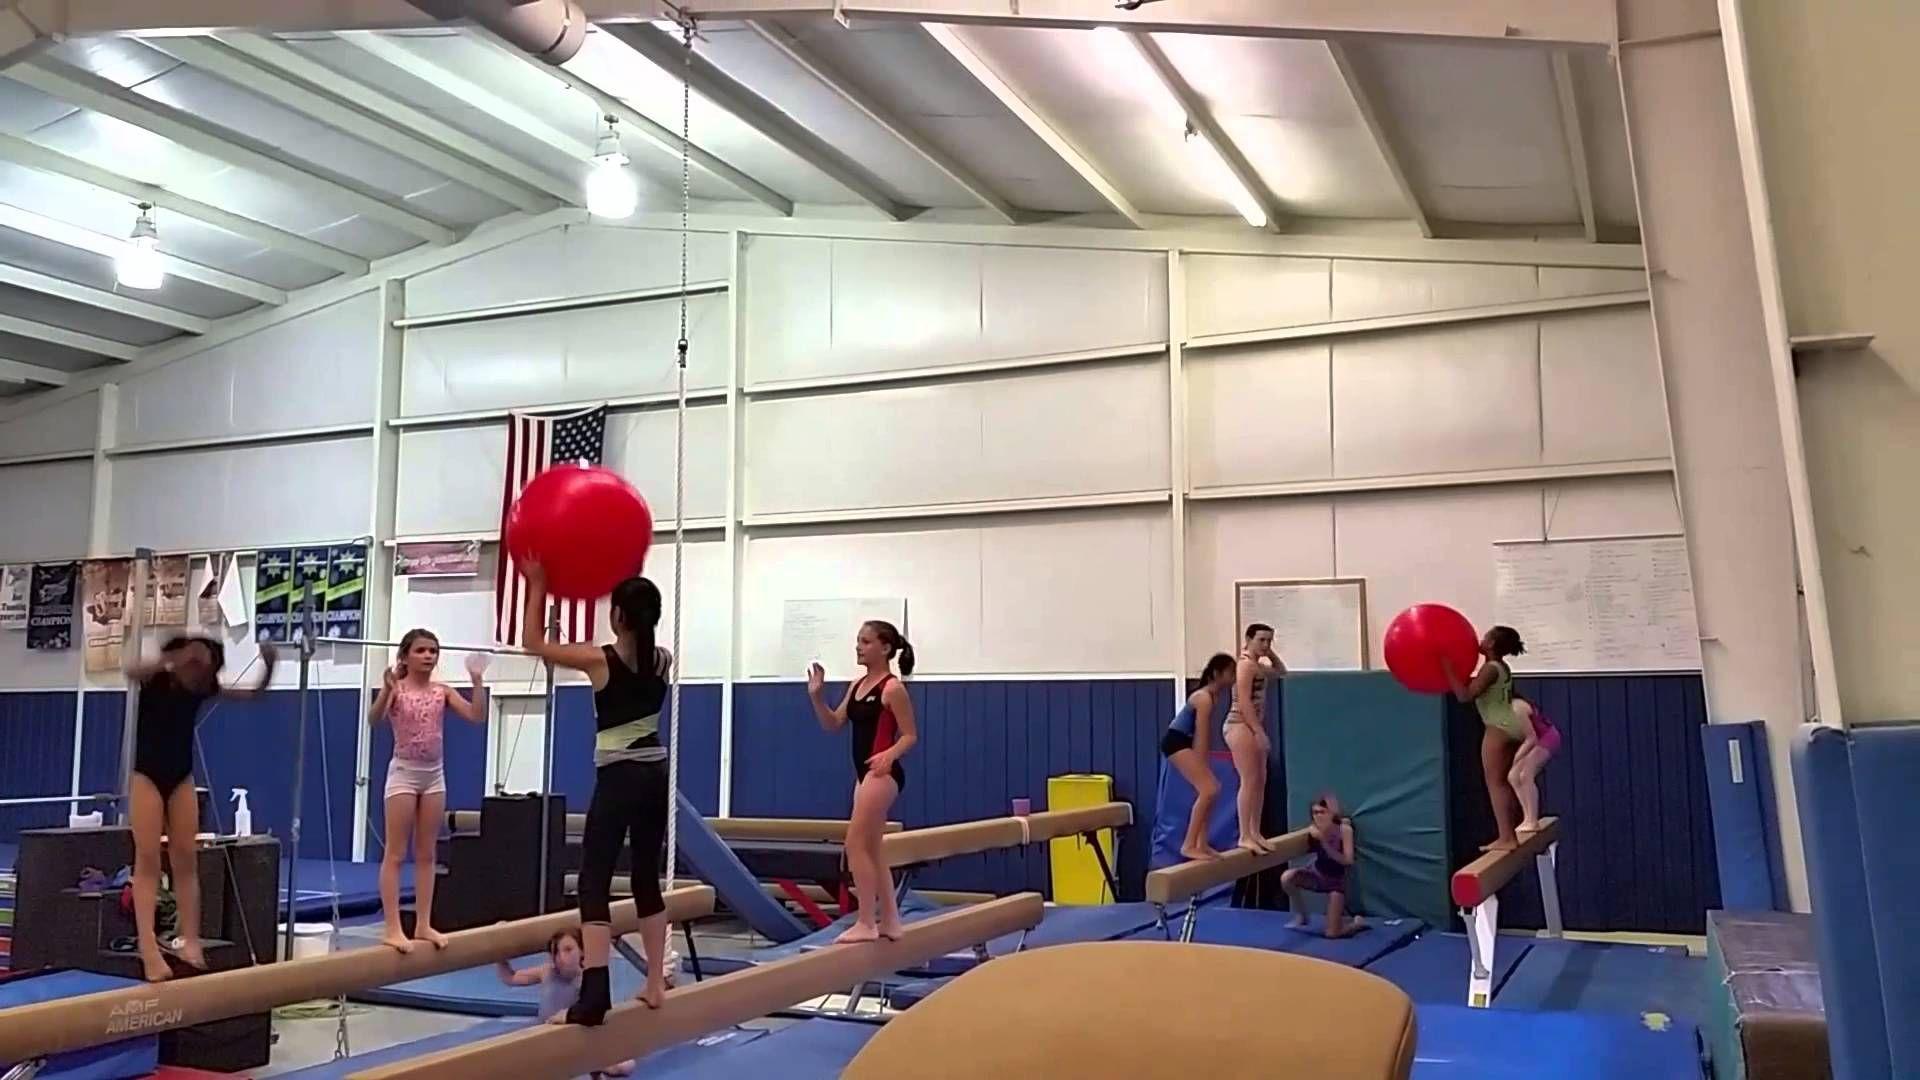 BEAM BALL (Gymnastics/Fitness/Games) Gymnastics games